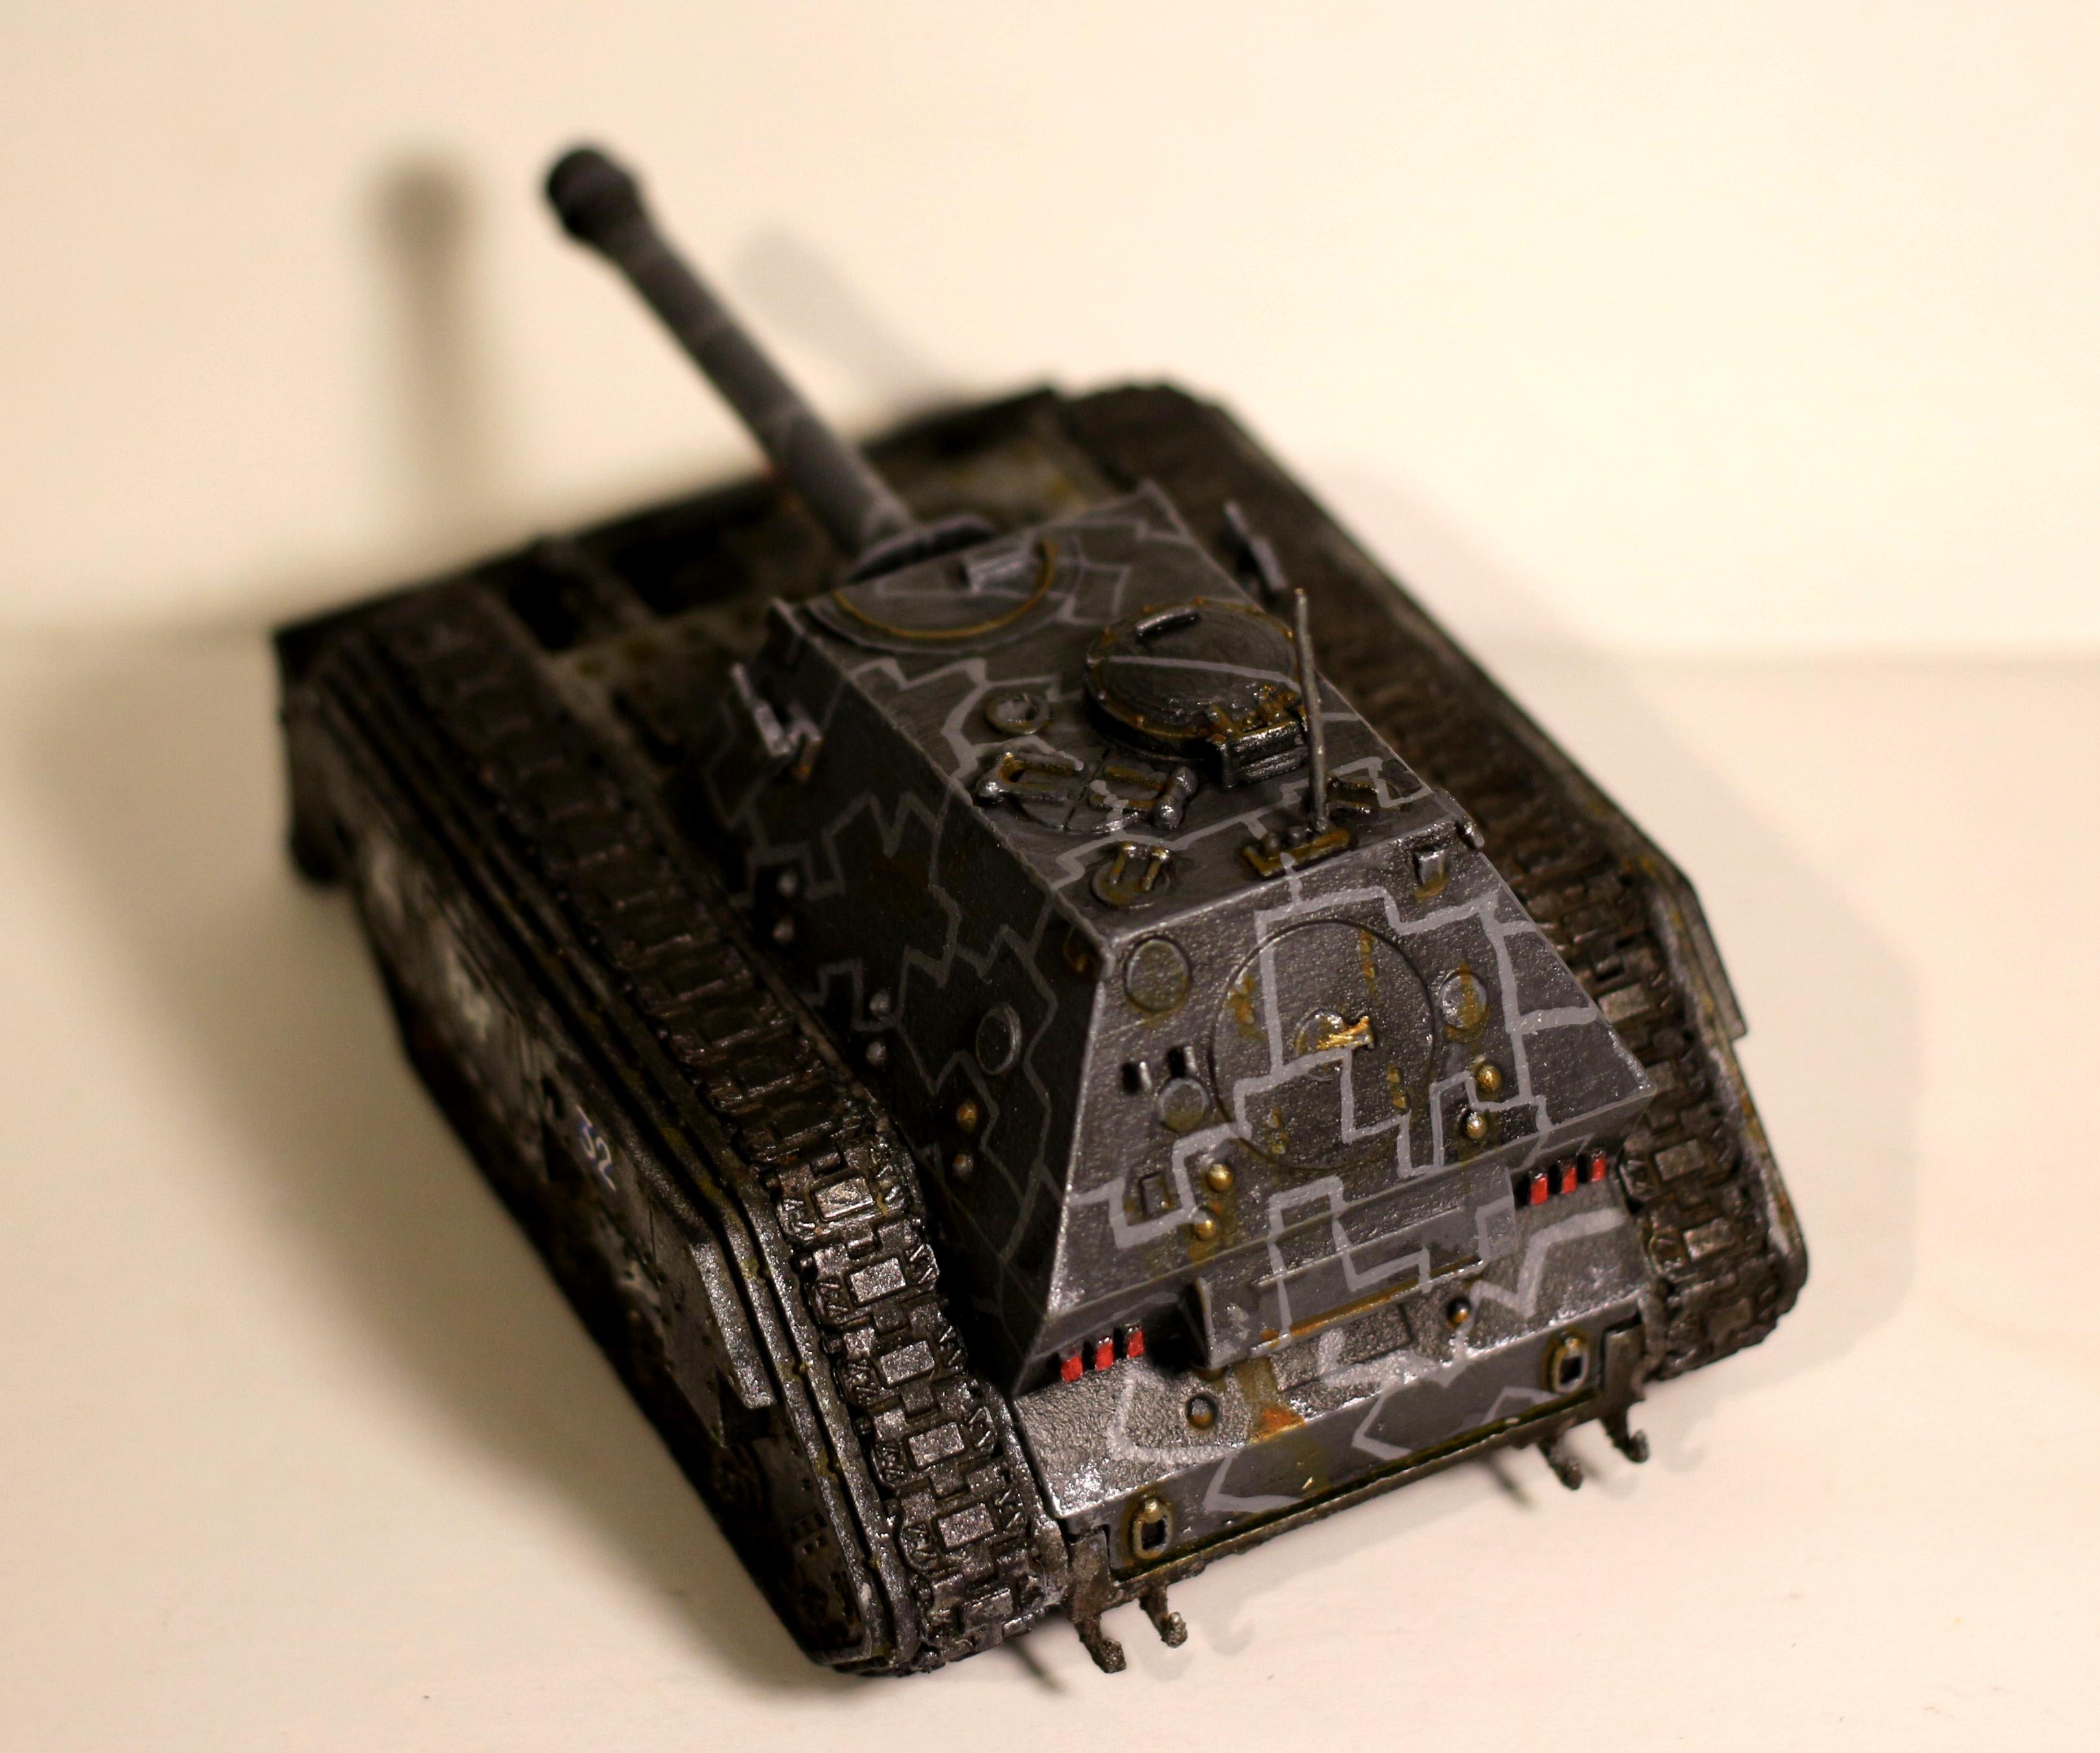 3d Print, 3d Printed, Alternative, Cabin, Chimera, Conversion, Destroyer, Ferdinand, Guard, Imperial, Tank, Vehicle, Warhammer 40,000